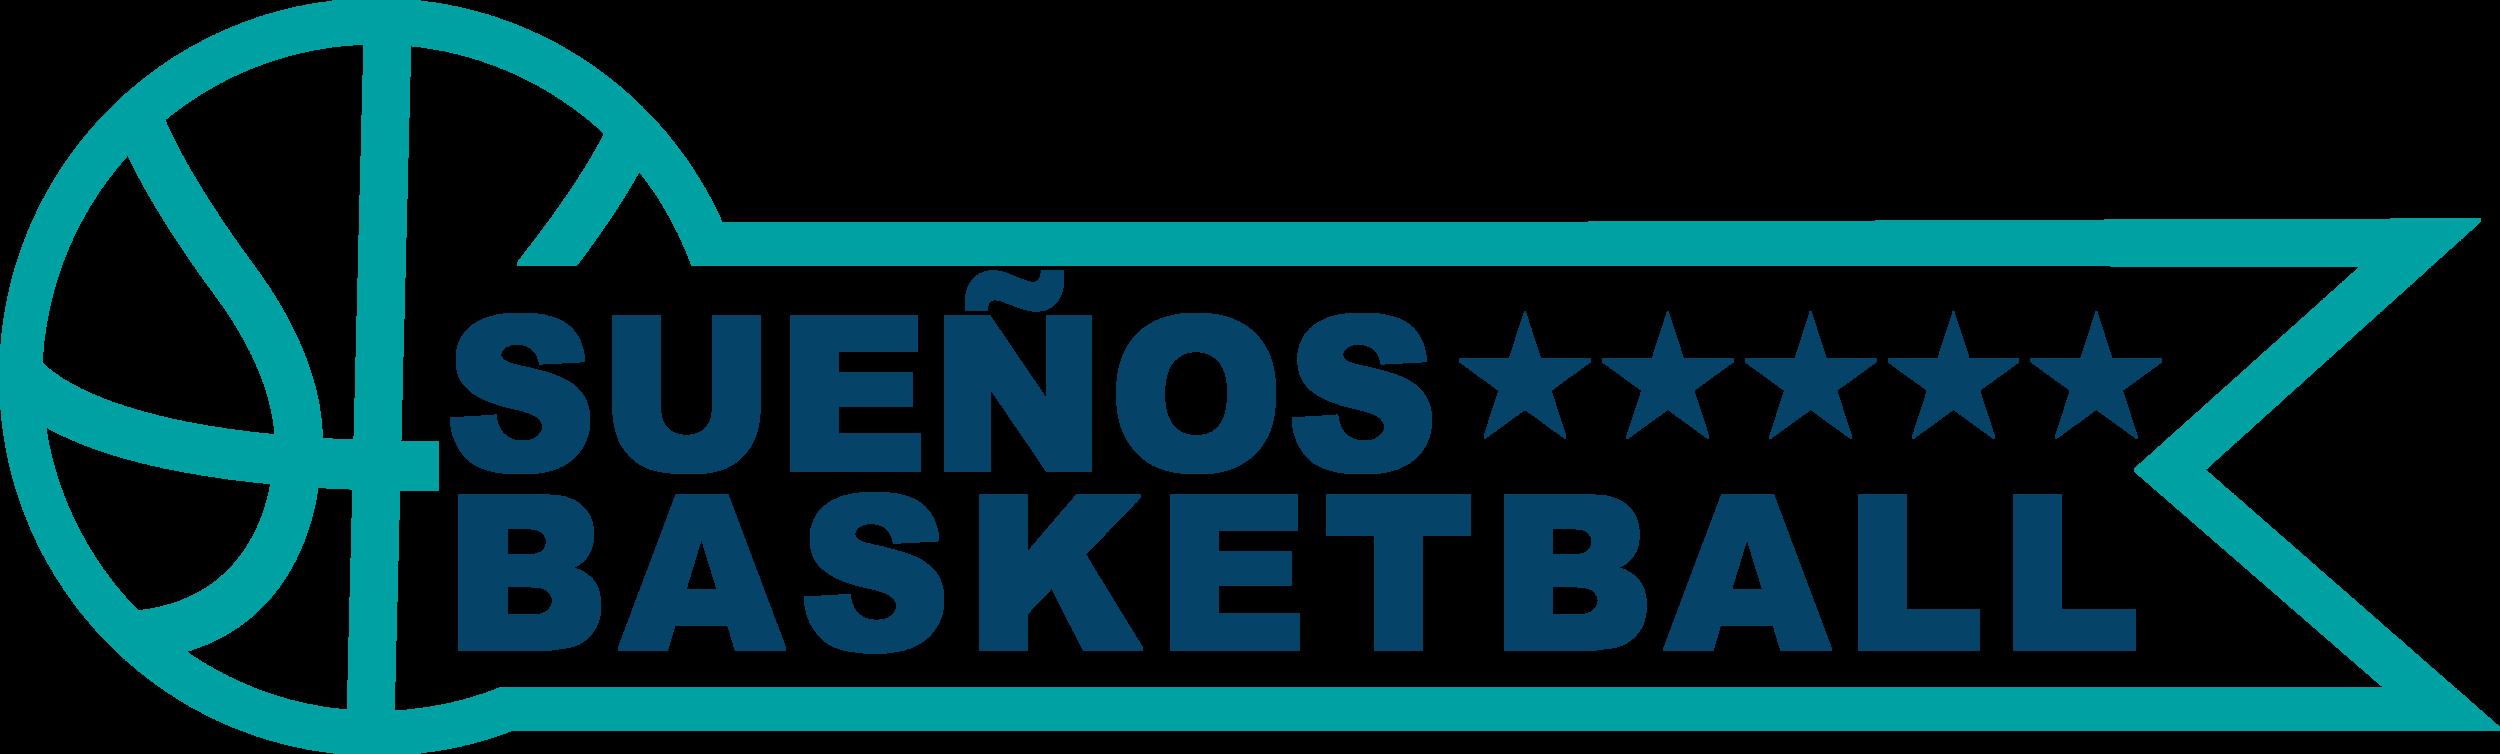 suenosbasketball-logo.png